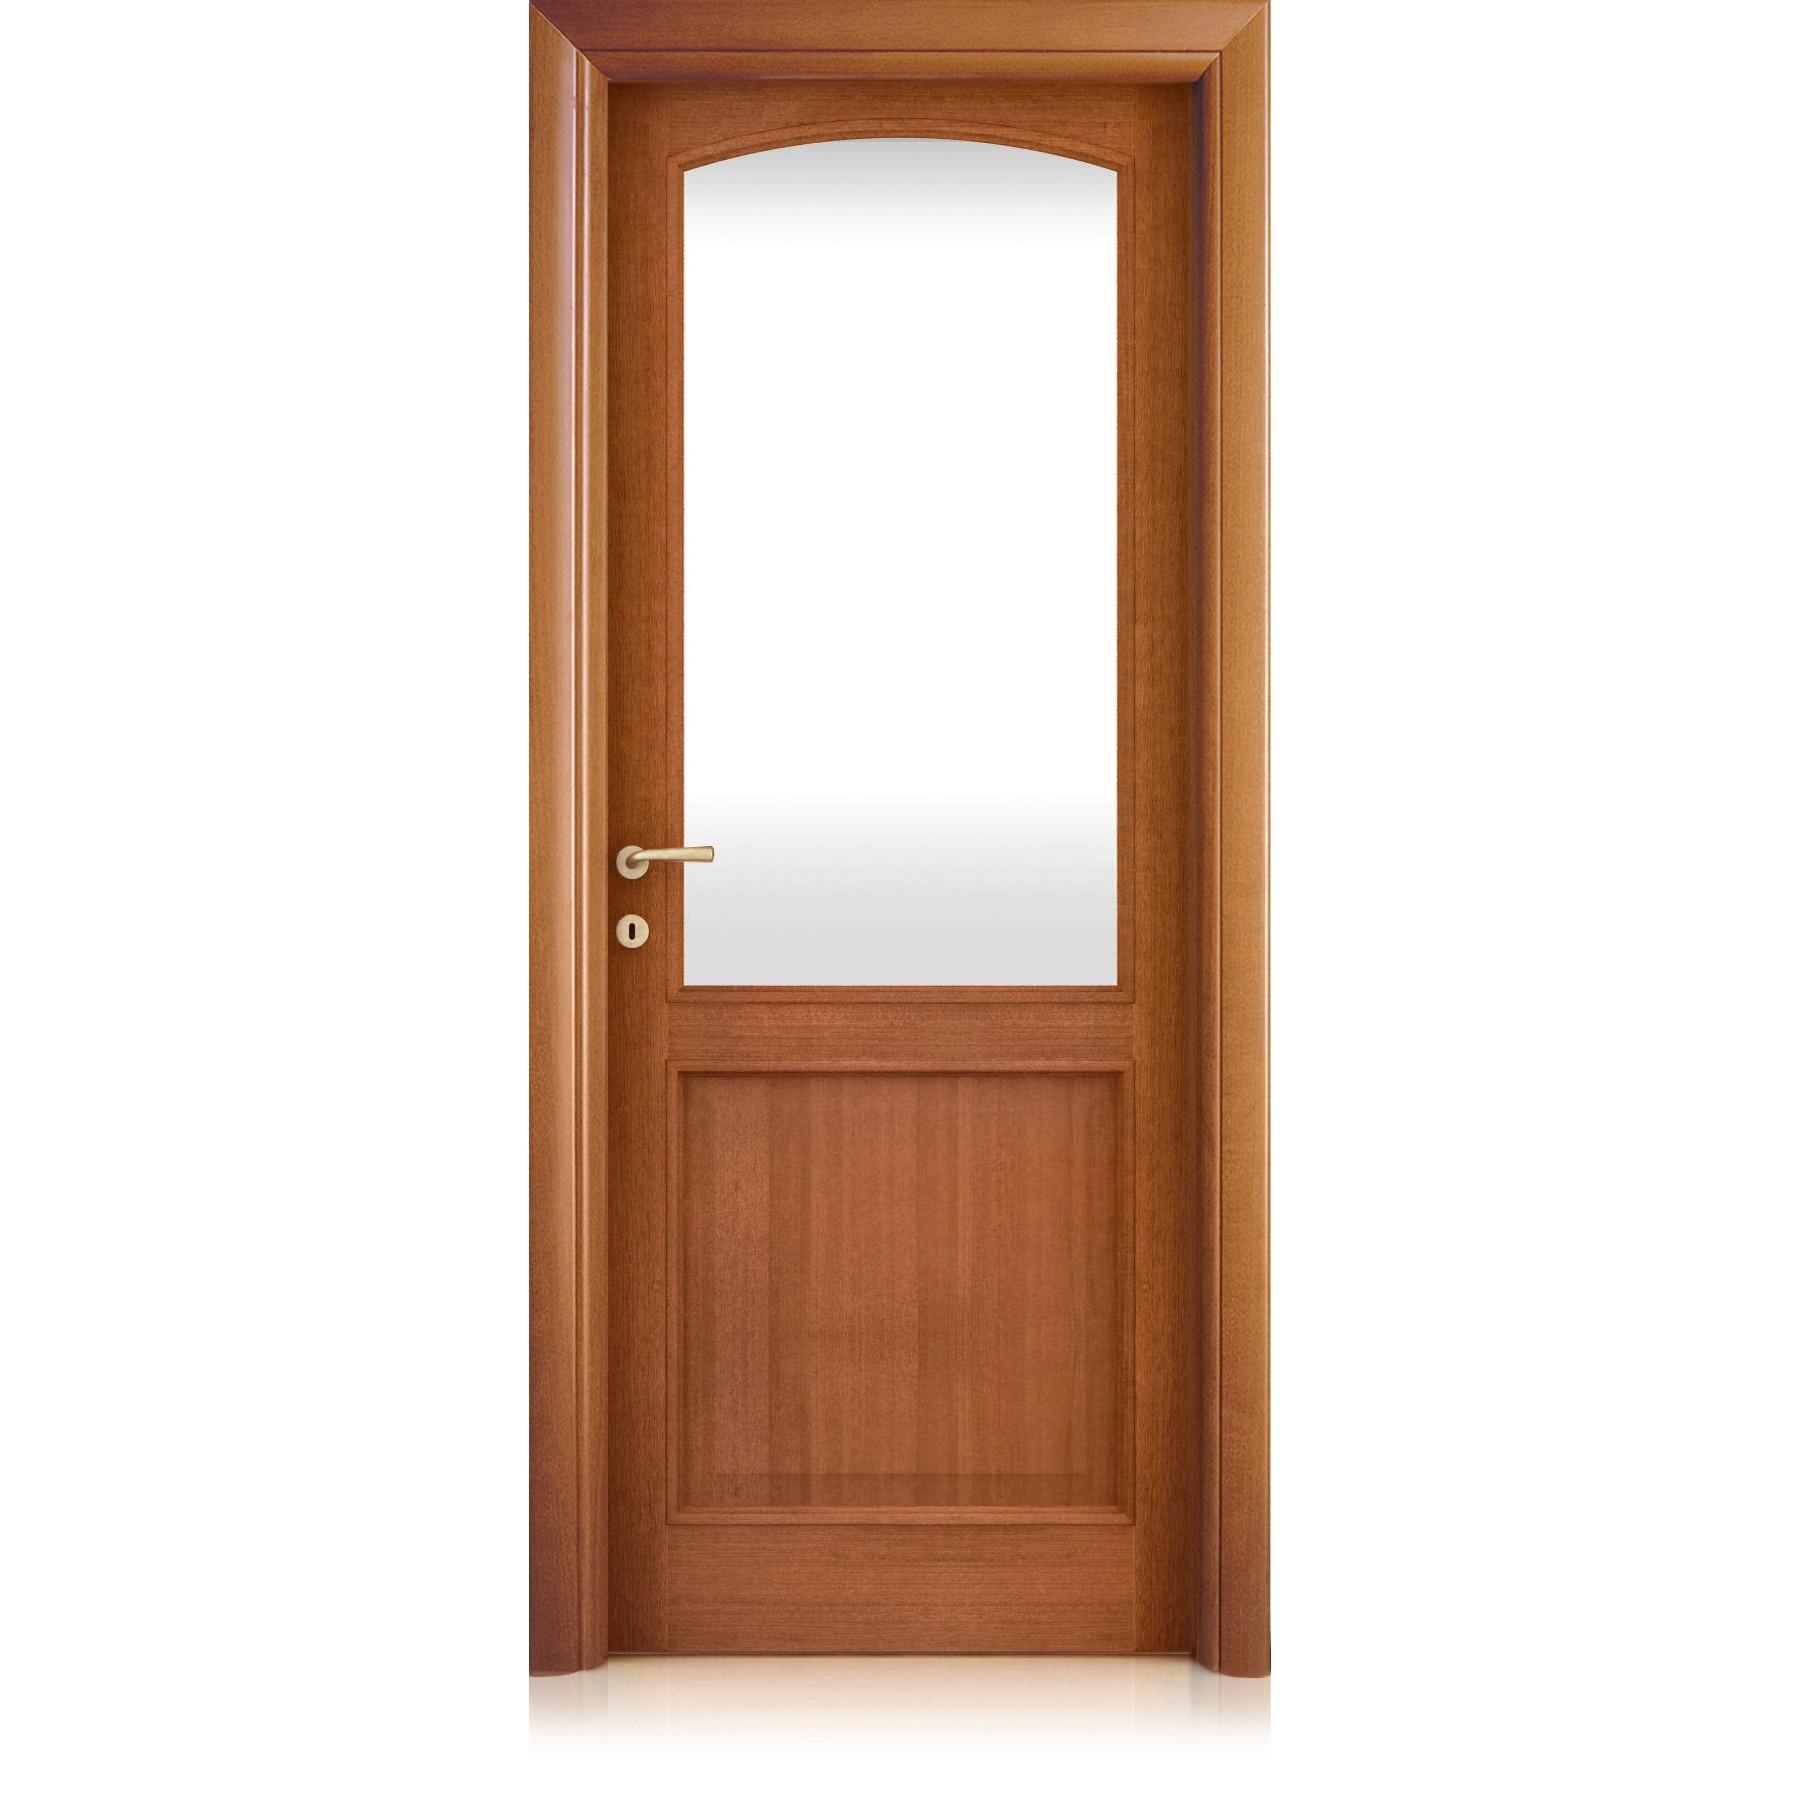 Magika Inciso quadrettato glass door